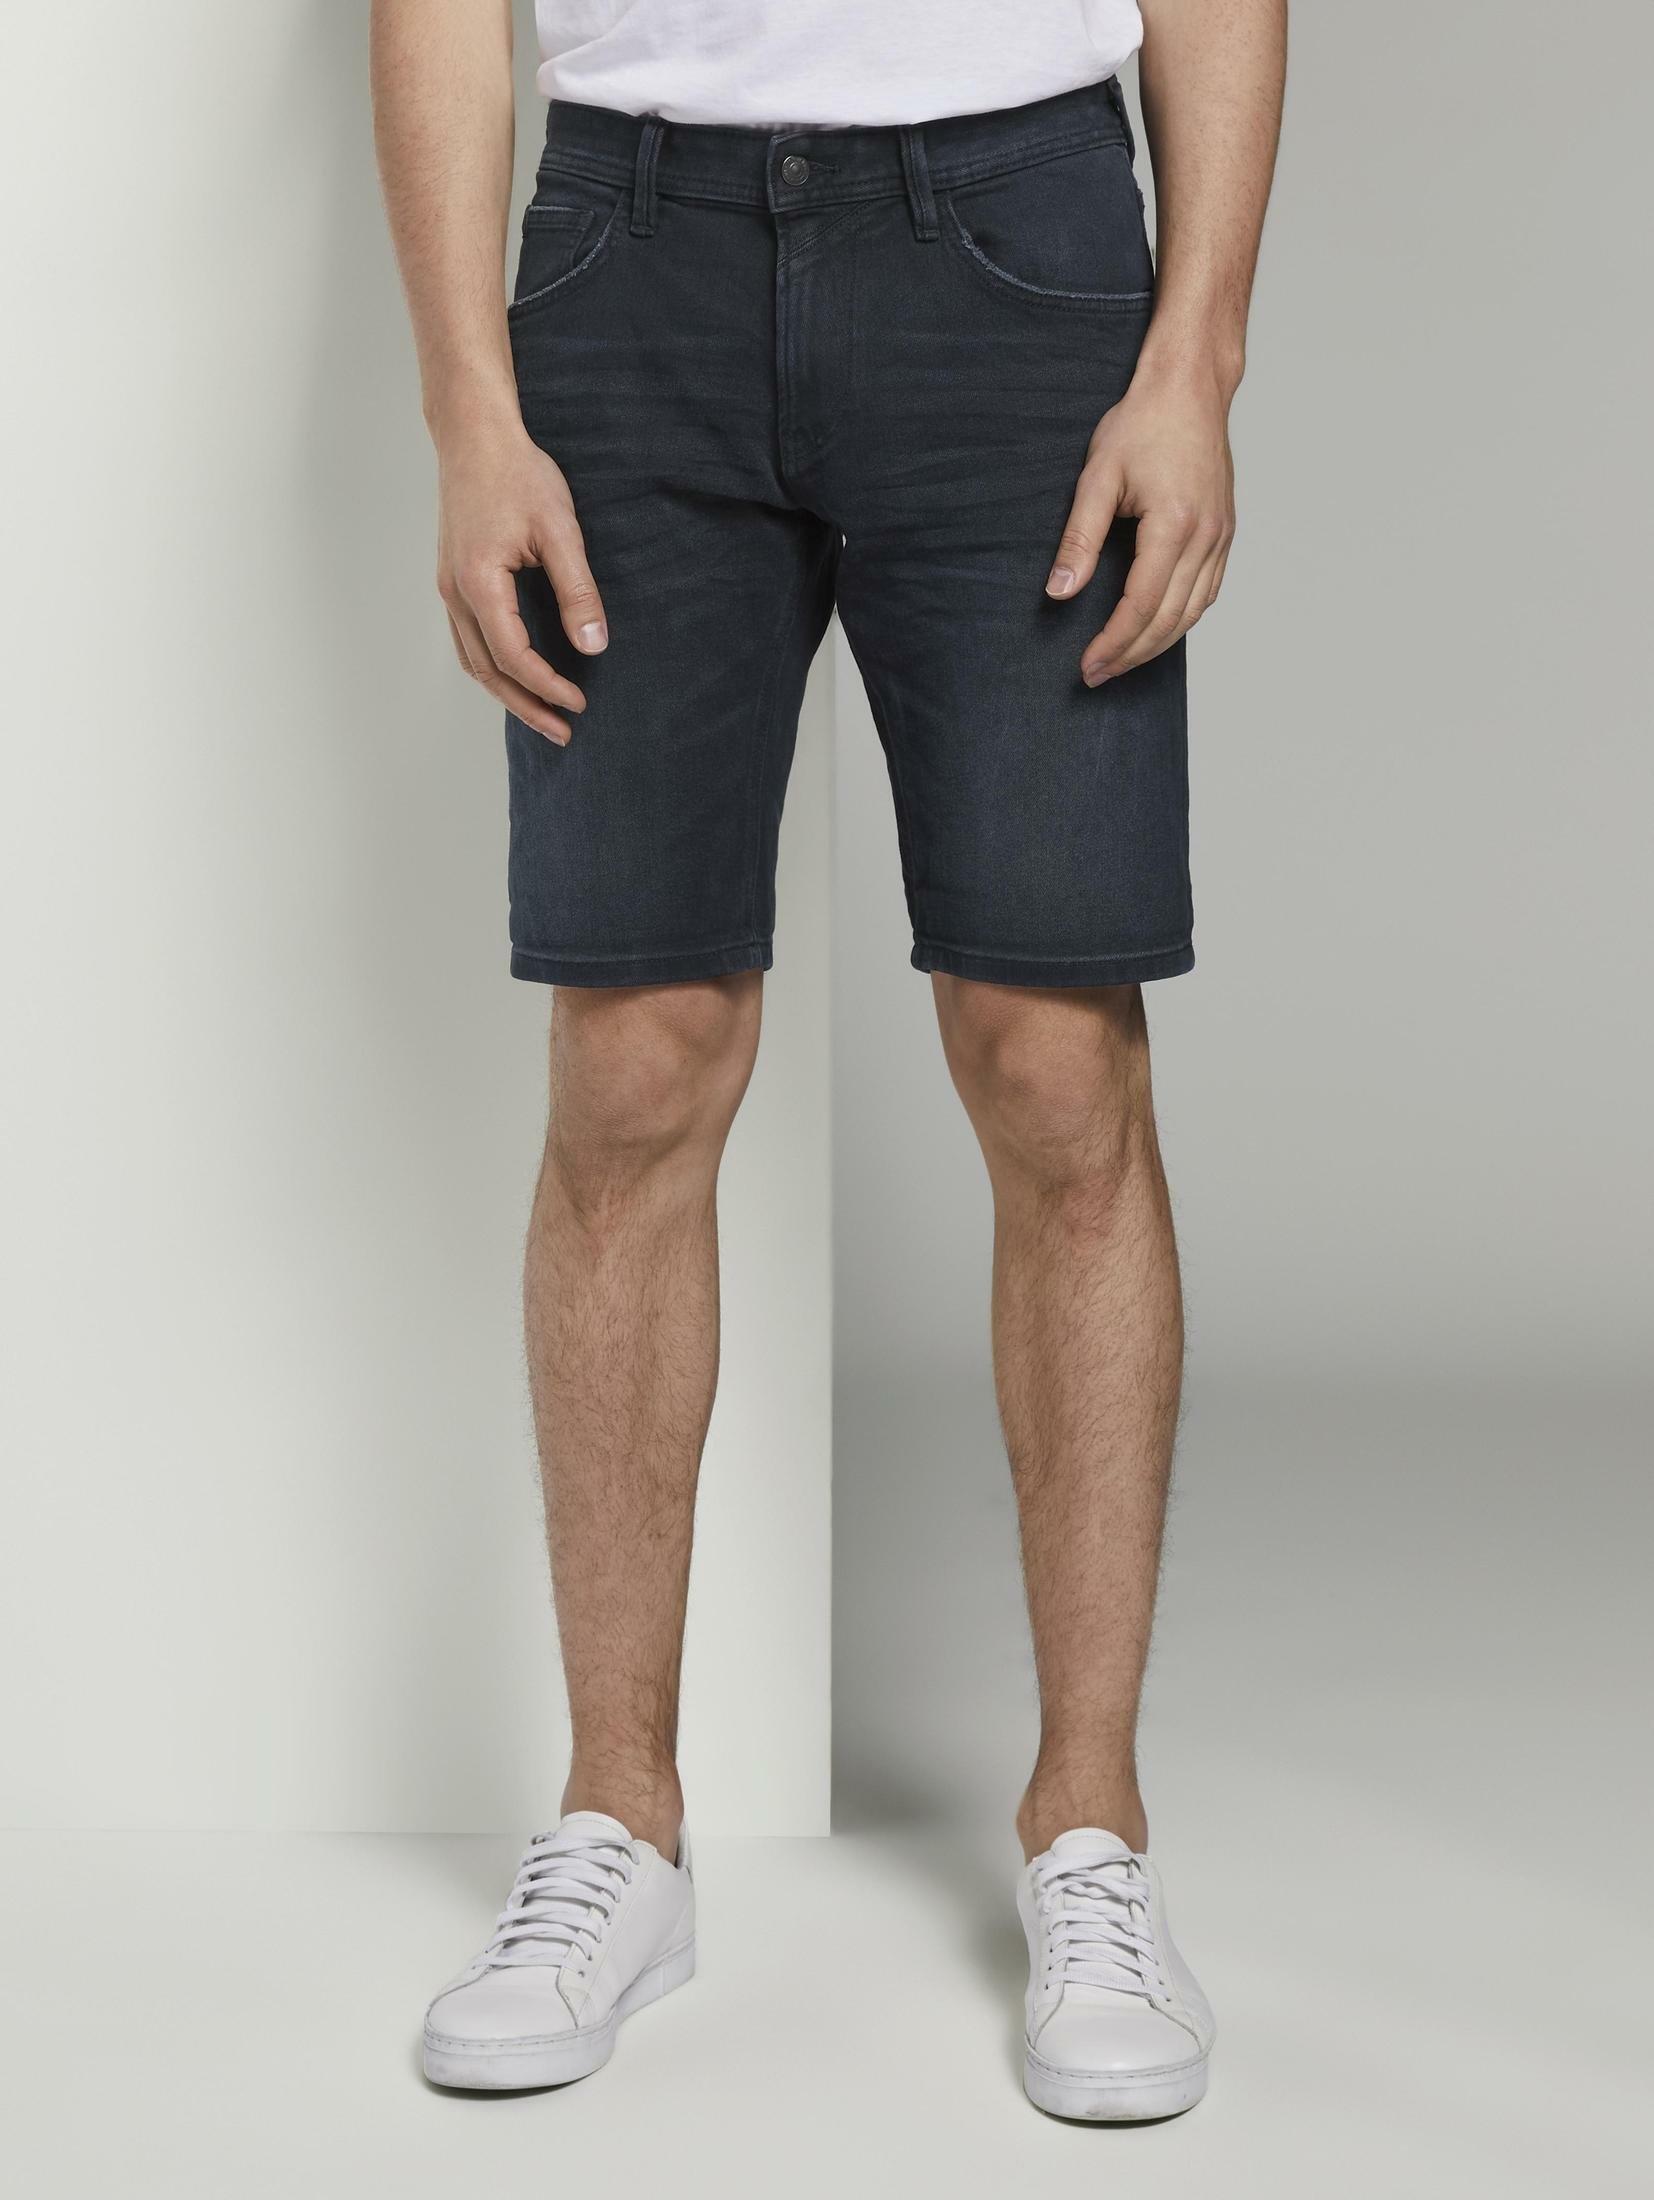 Tom Tailor Denim 5-pocketsjeans »Regular Jeansshorts in dunkler Waschung« voordelig en veilig online kopen